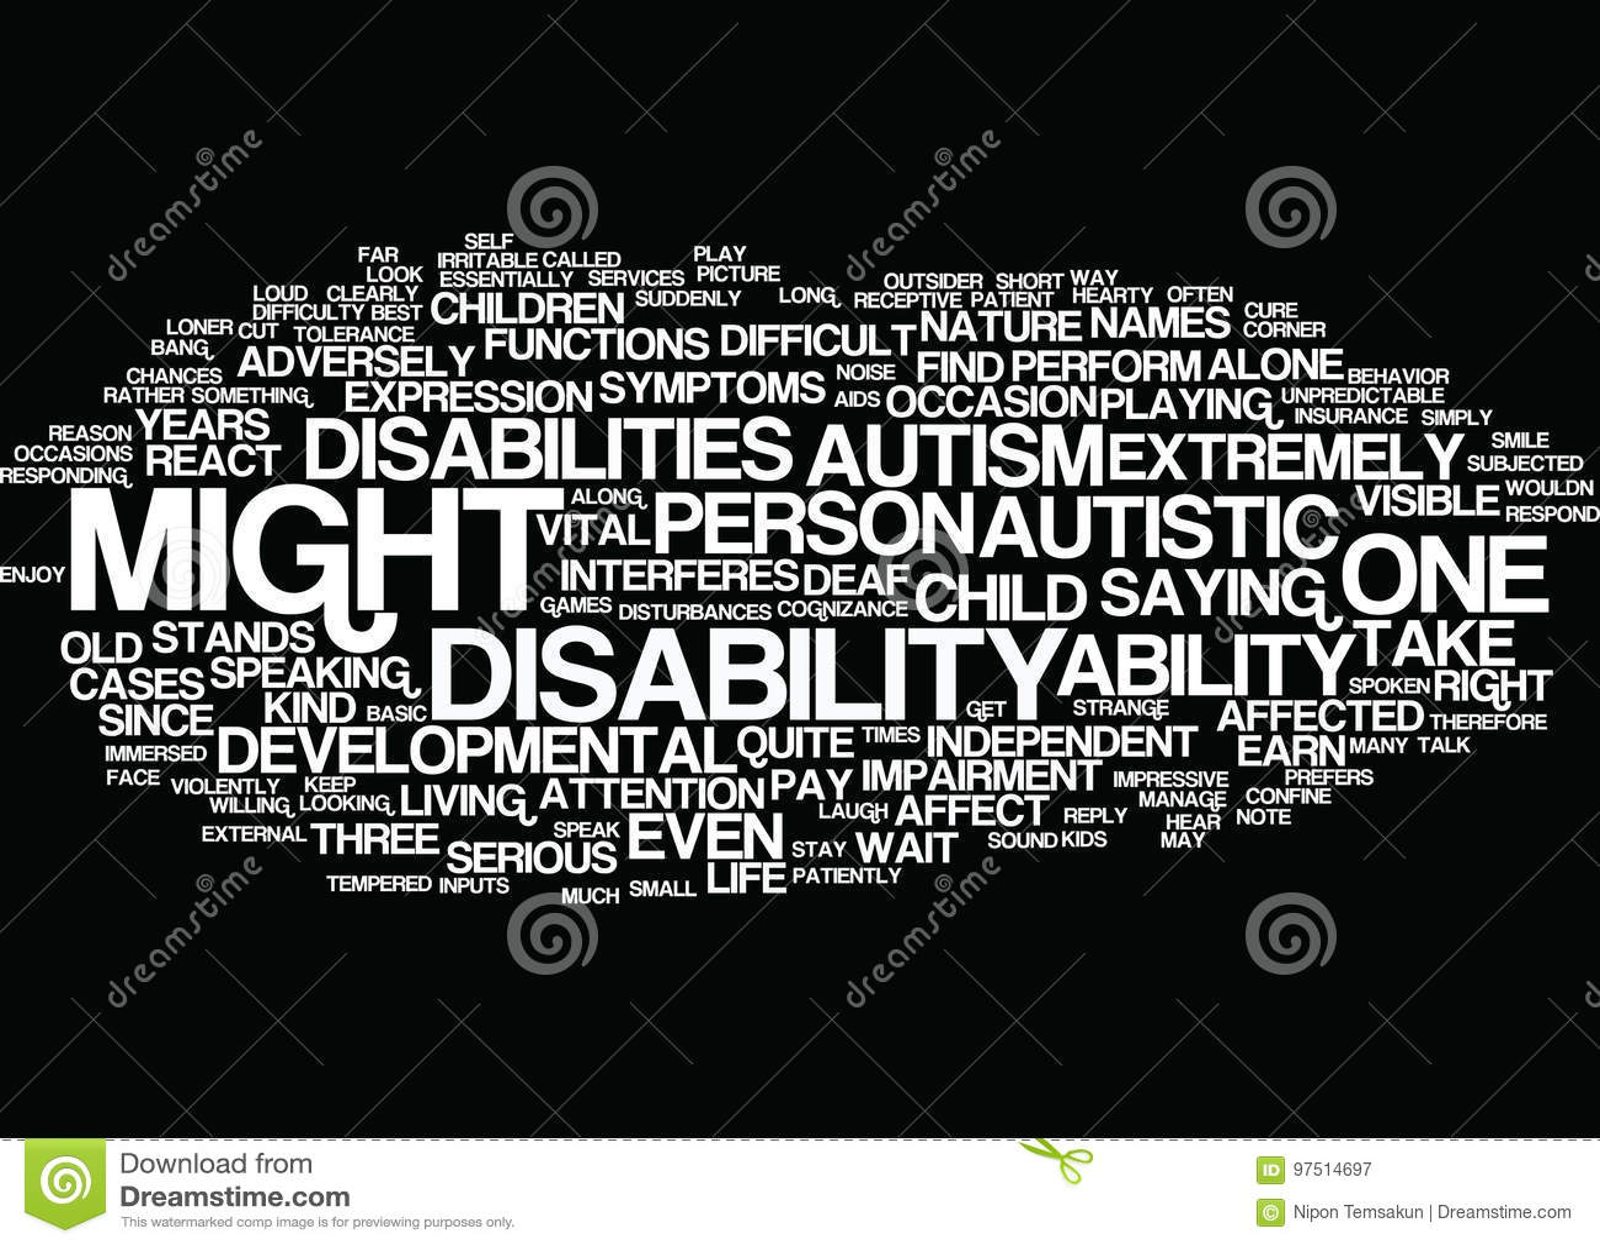 Autism A Difficult Developmental Disability Word Cloud Concept